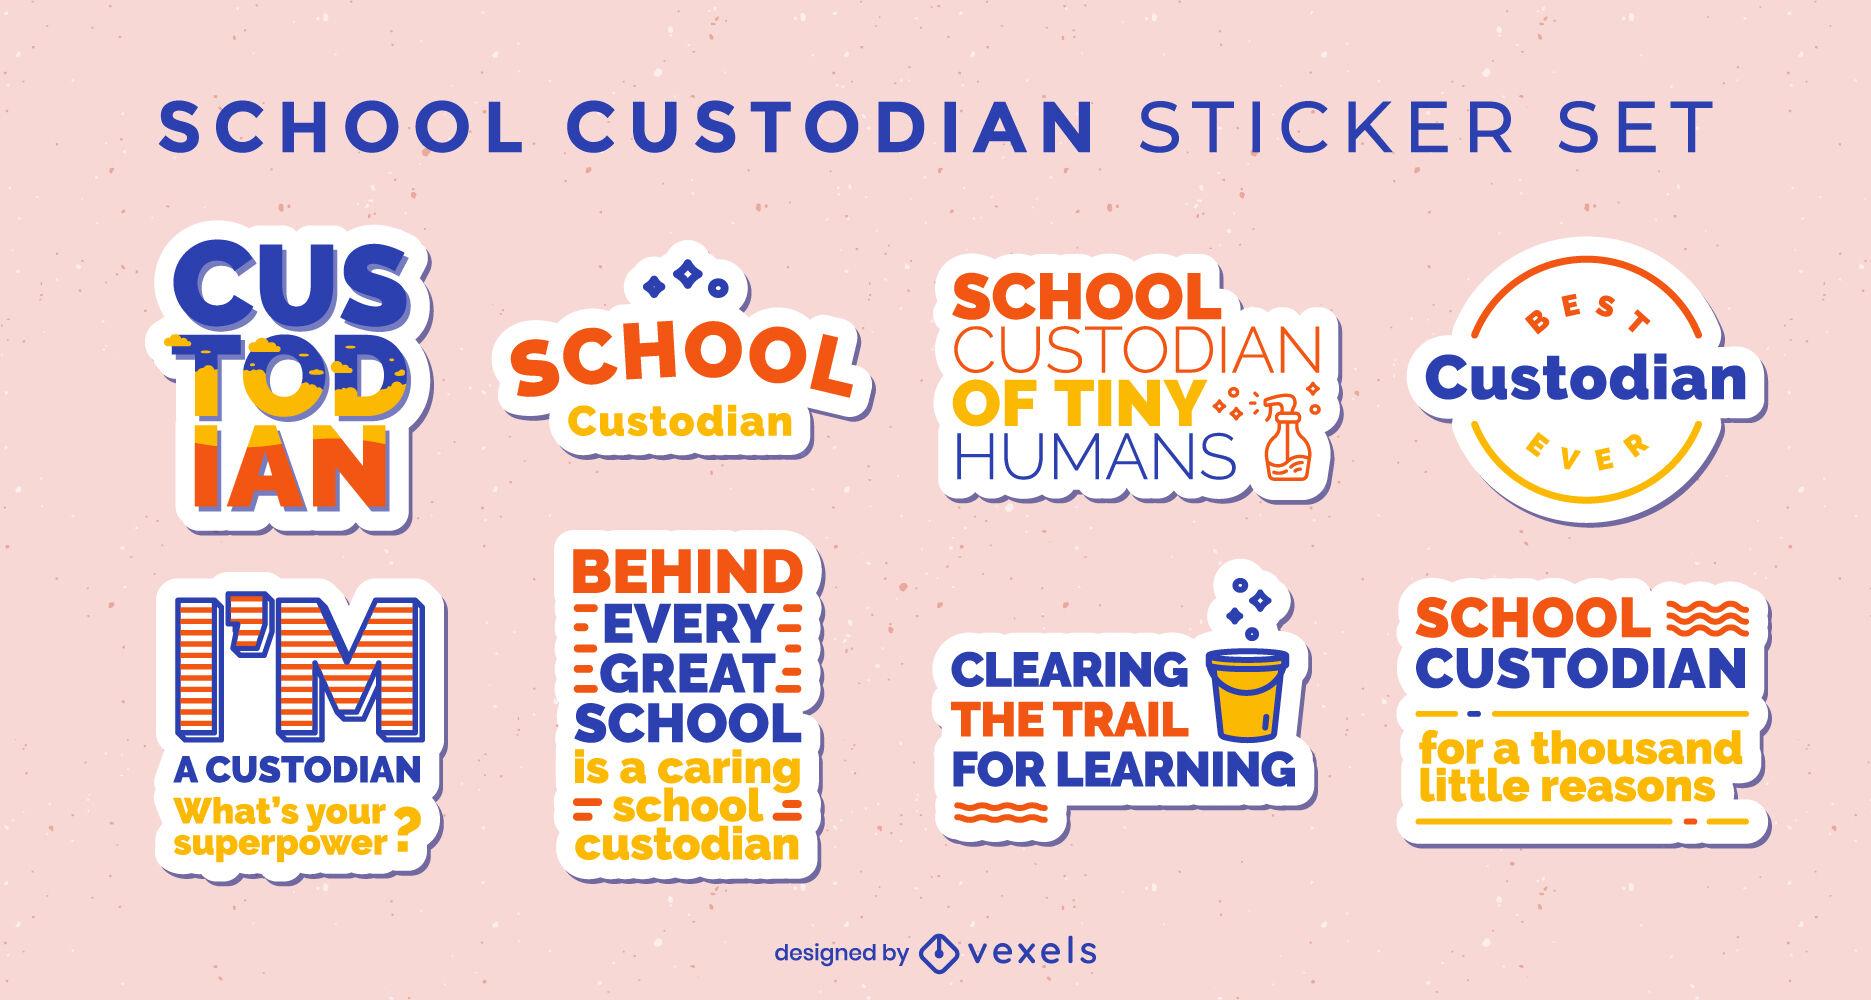 School custodian set of stickers